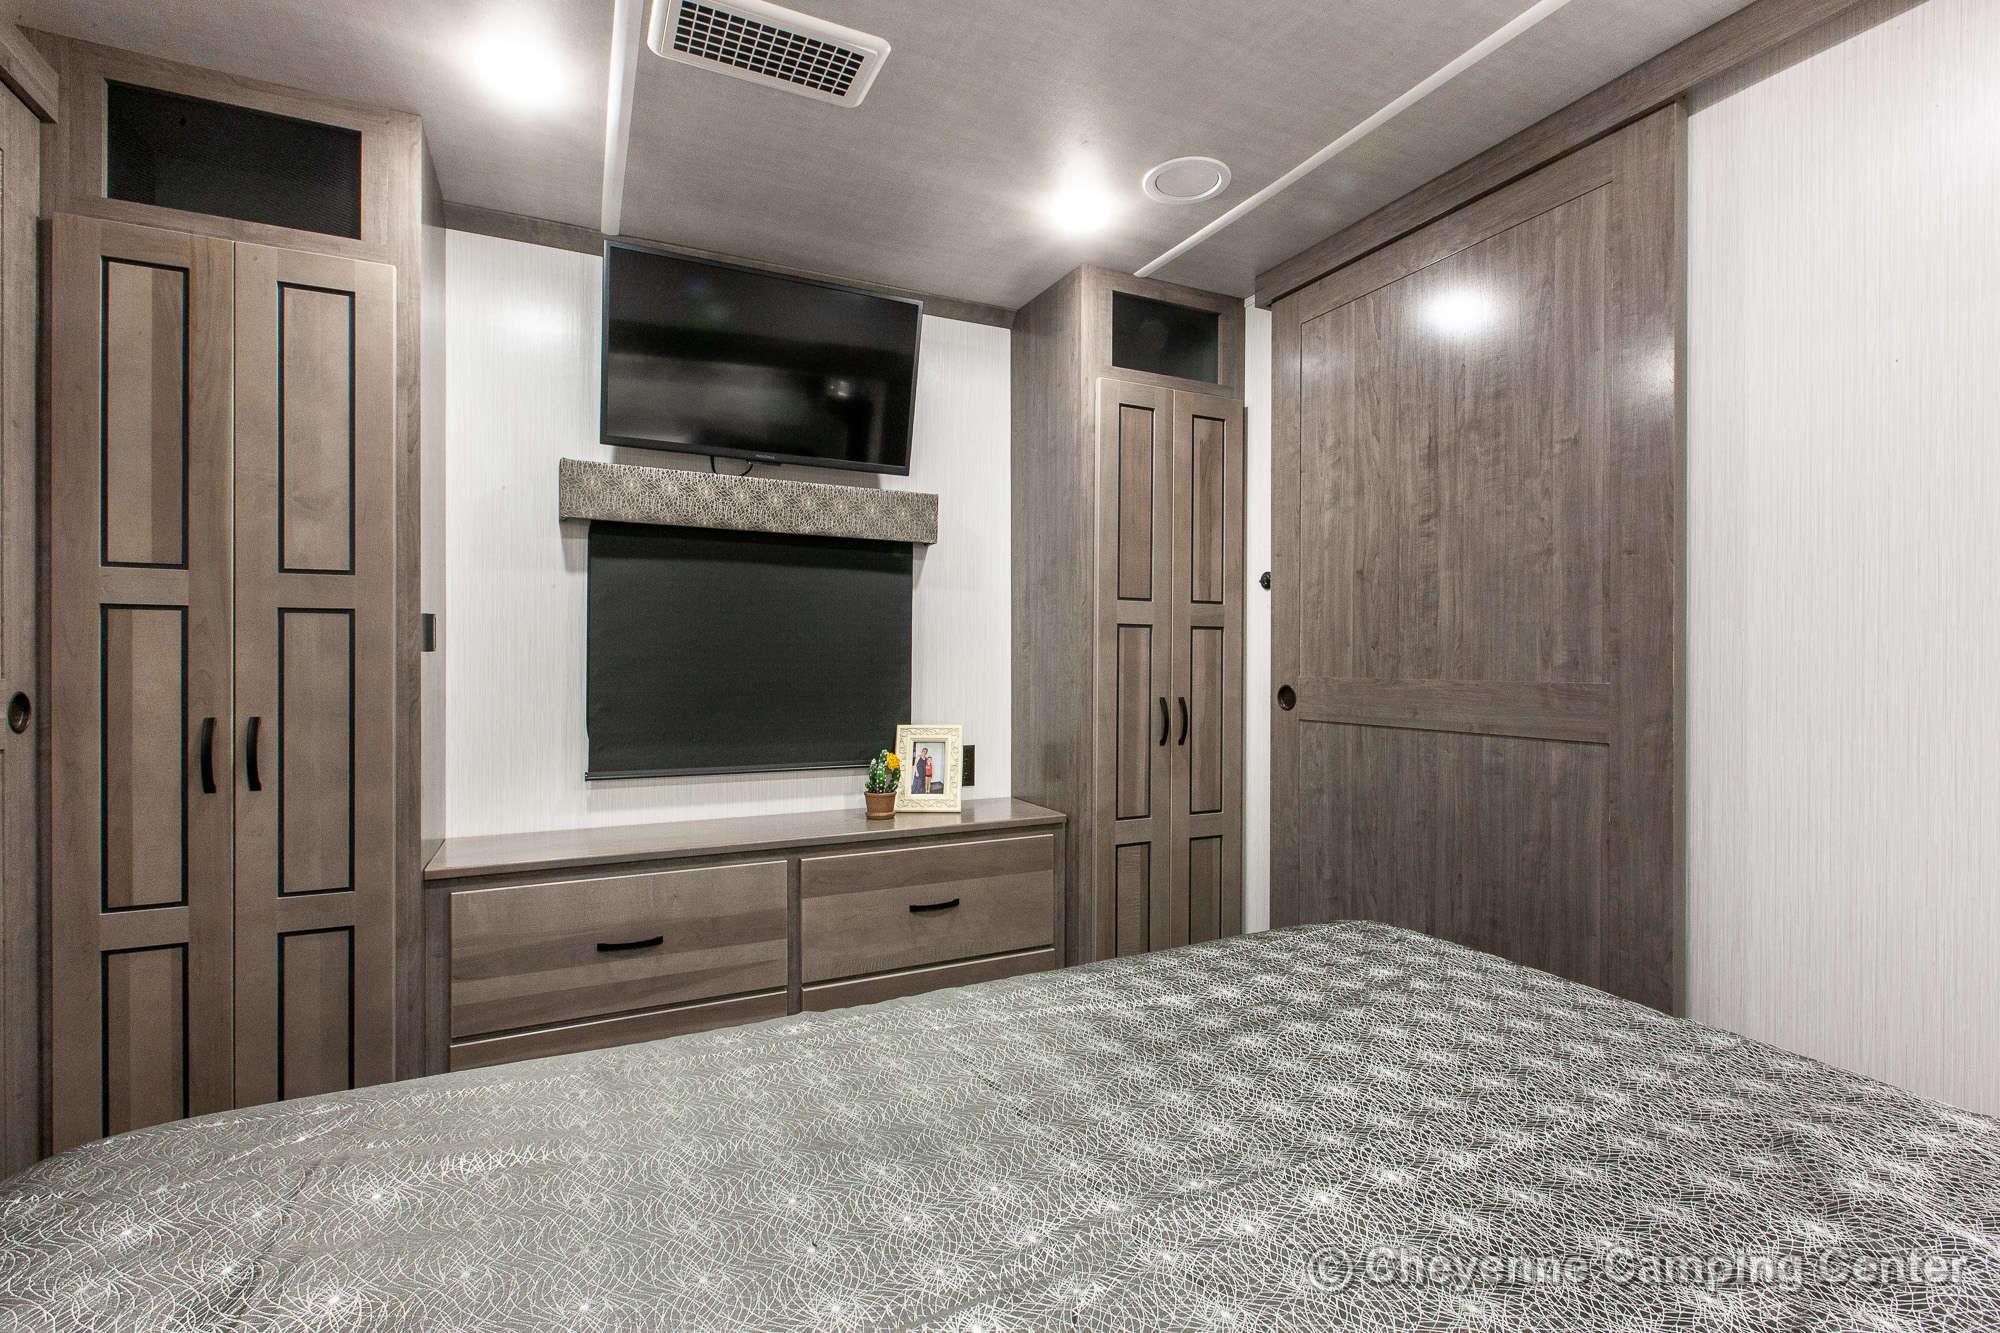 2021 Forest River Cedar Creek 371FL Fifth Wheel Interior Image